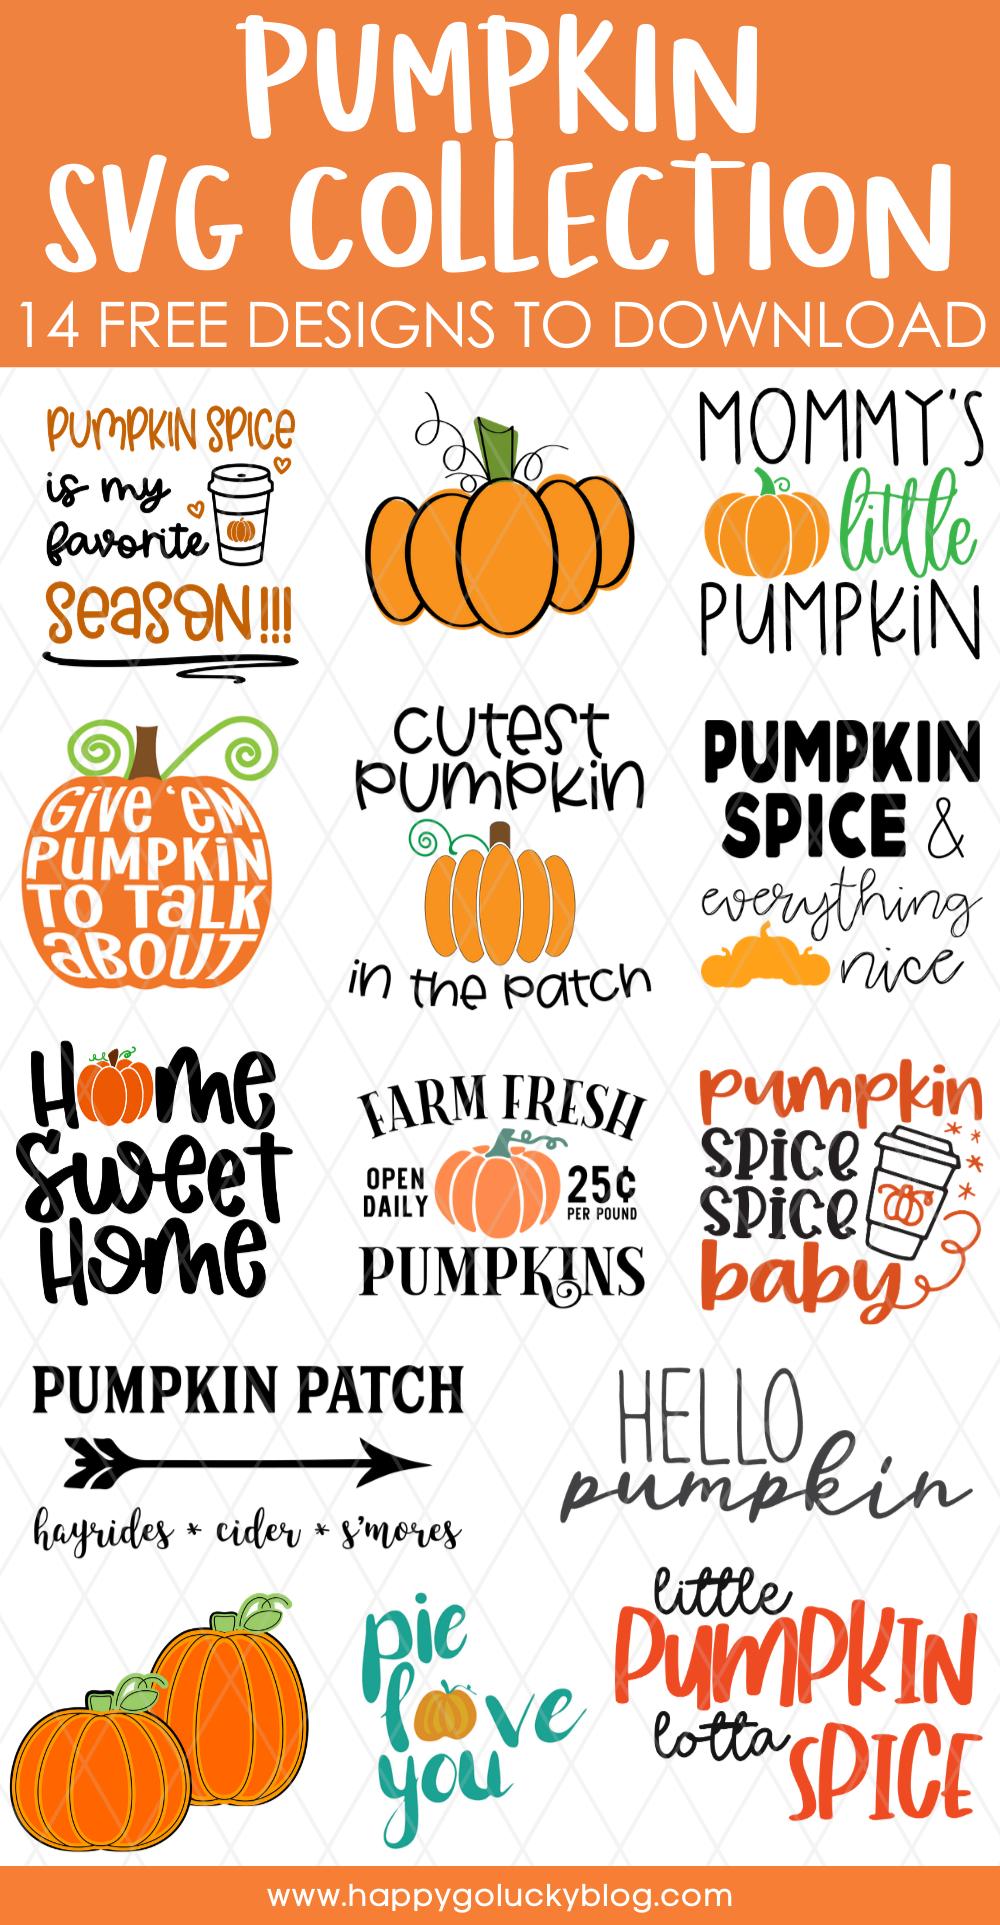 Free Pumpkin SVG Collection